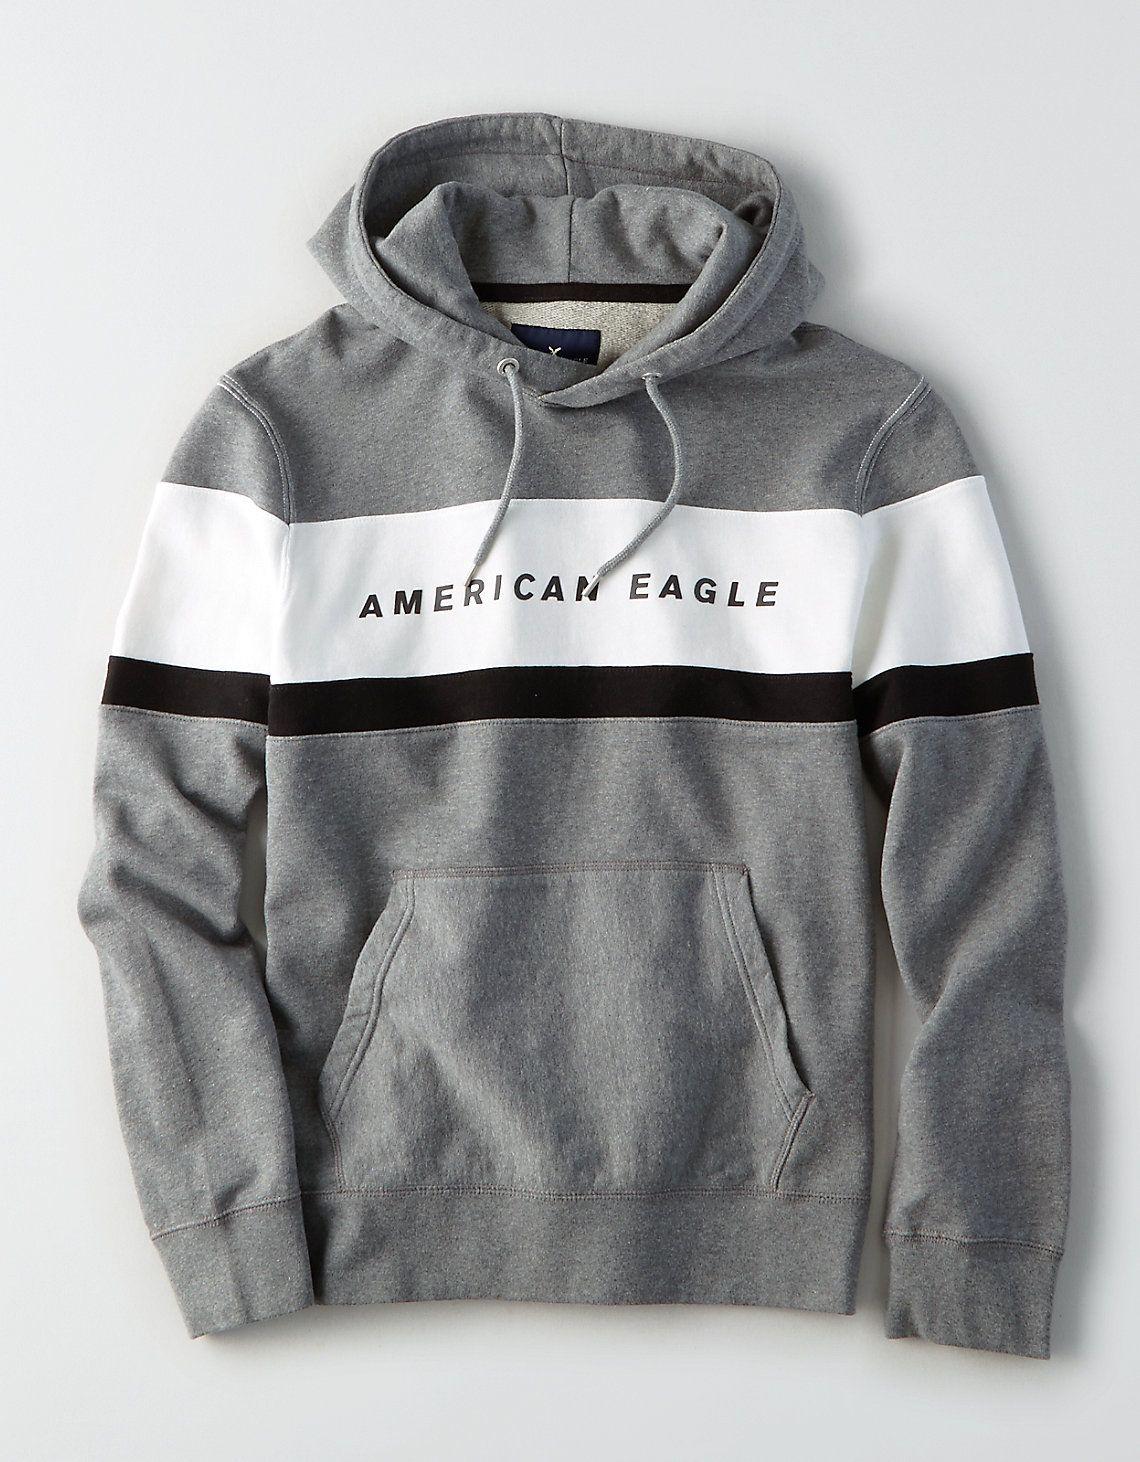 Pin By Art Win On Brrr It S Getting Cold Outside Hoodie Fashion Hoodie Outfit Men Mens Sweatshirts Hoodie [ 1462 x 1140 Pixel ]